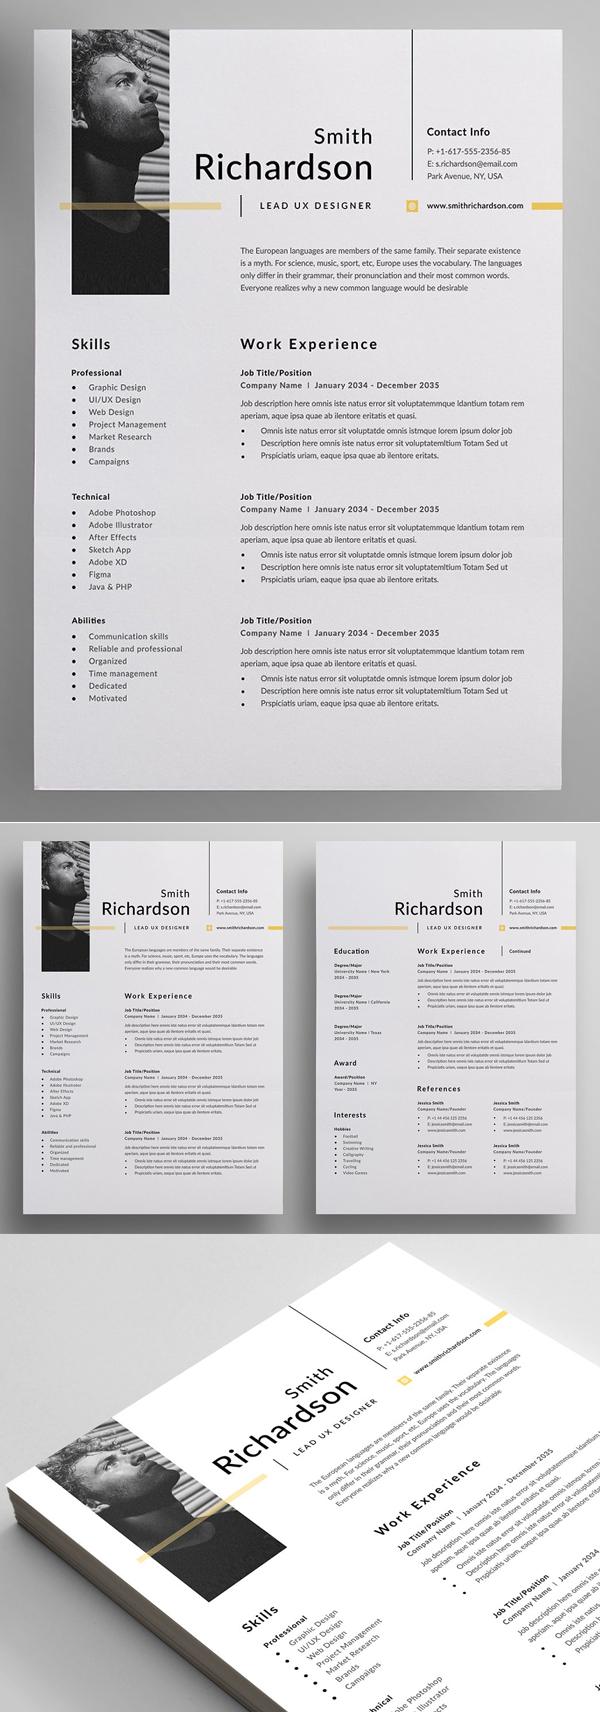 50 Best Resume Templates Of 2020 - 18